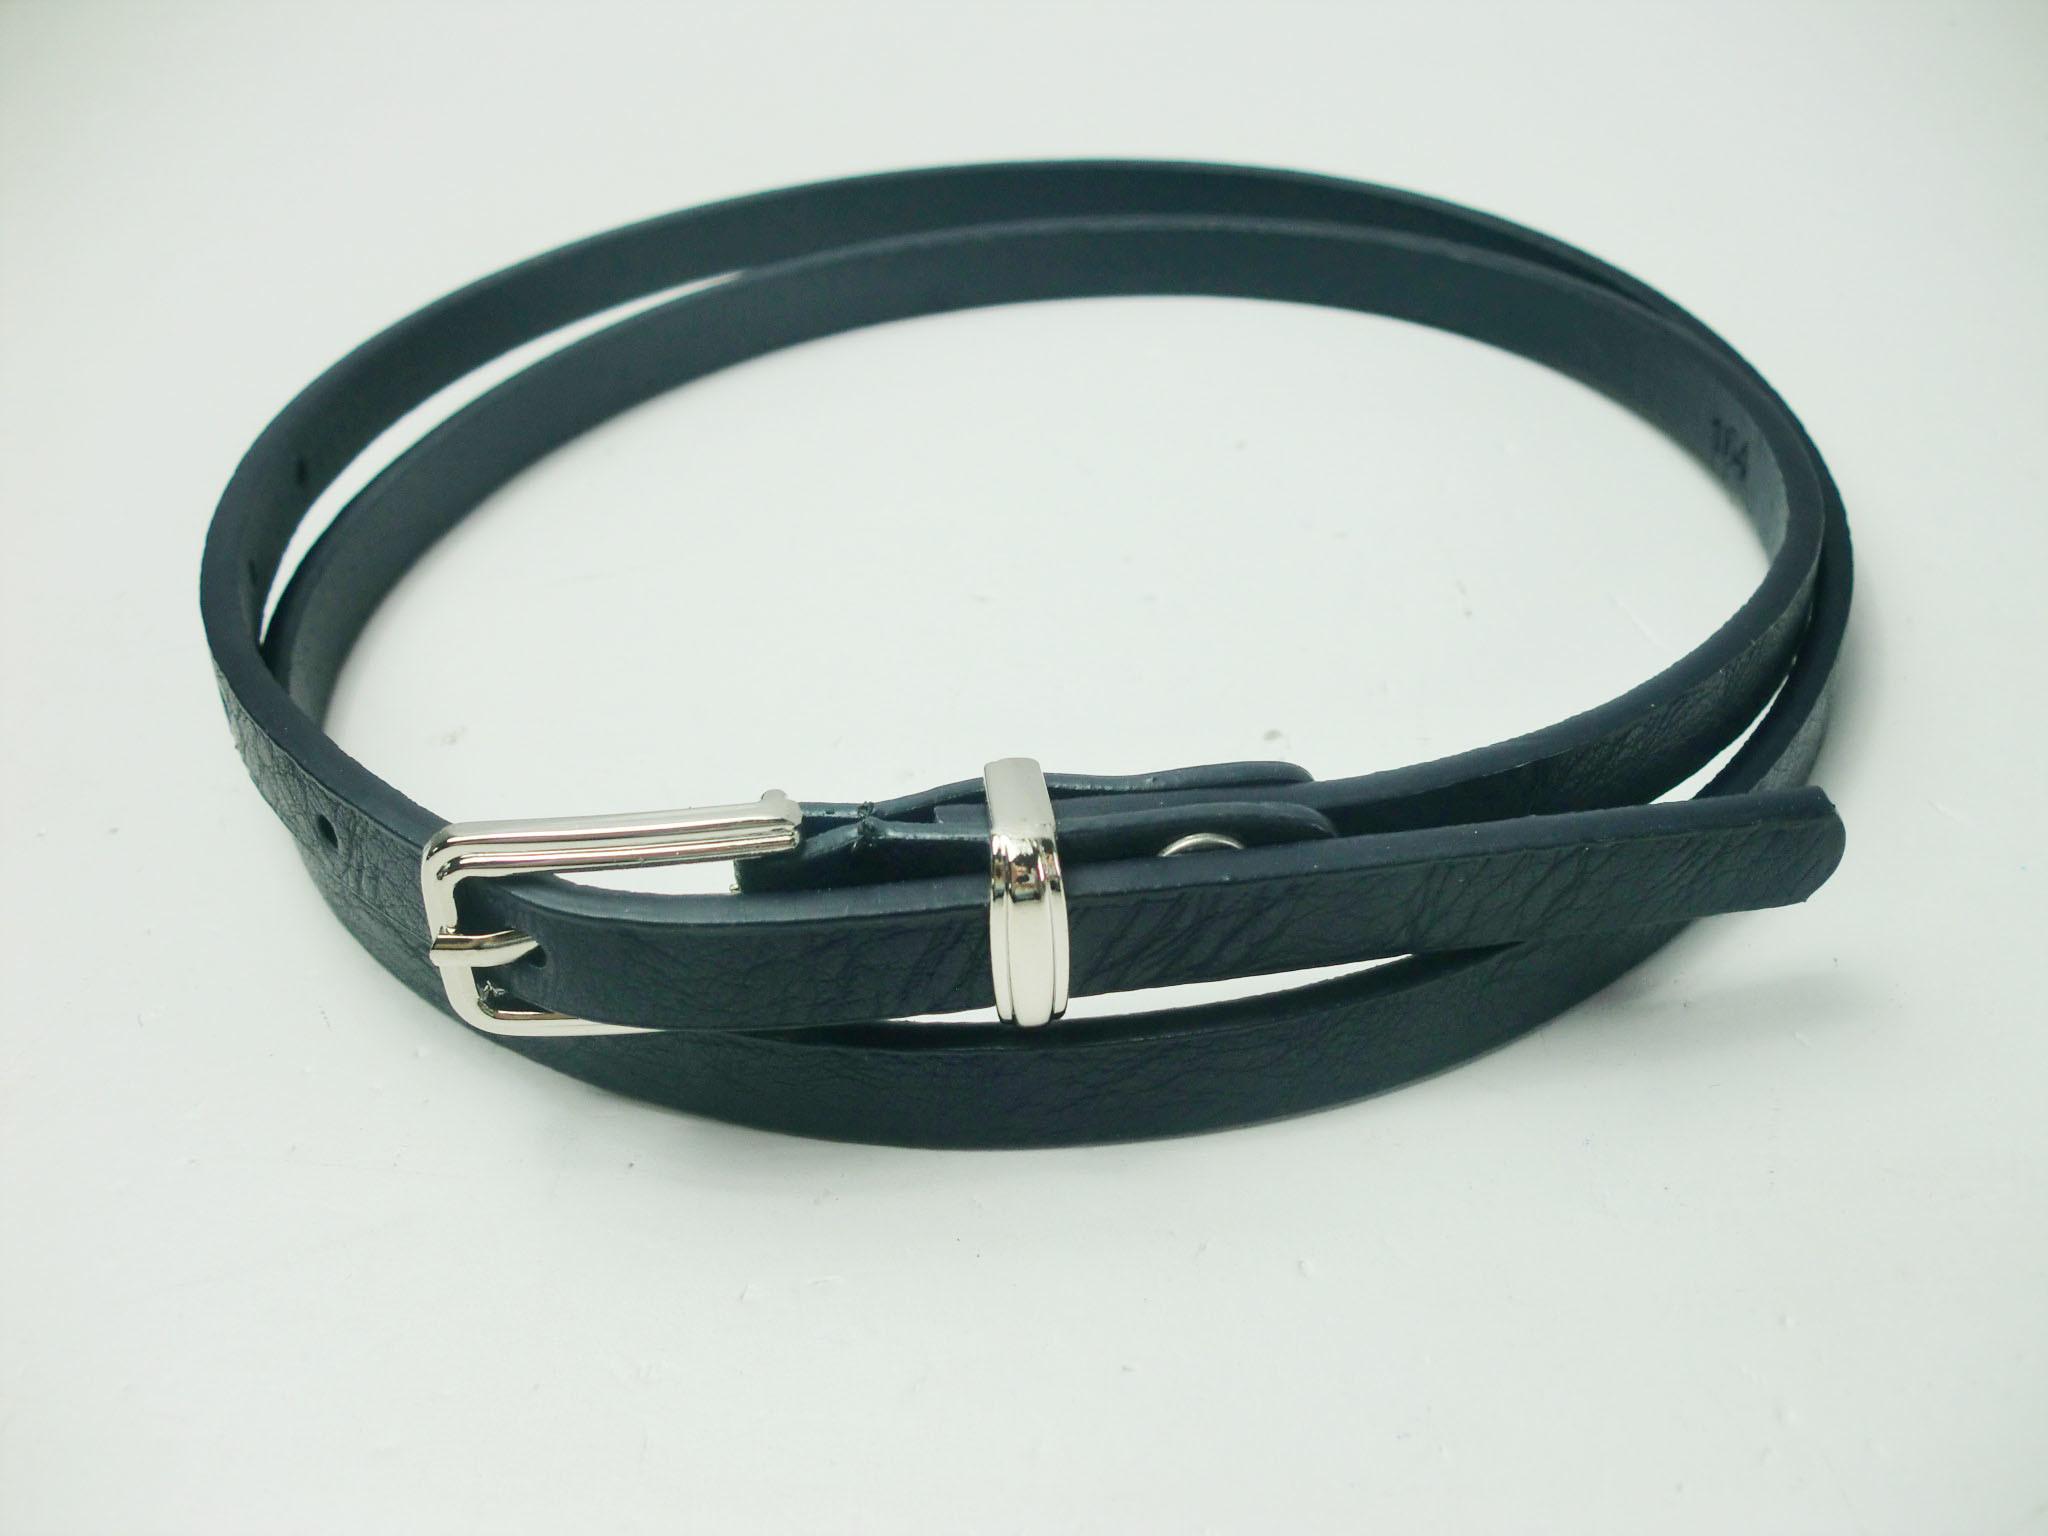 PU Belt (JB201206143) Approval by ITS